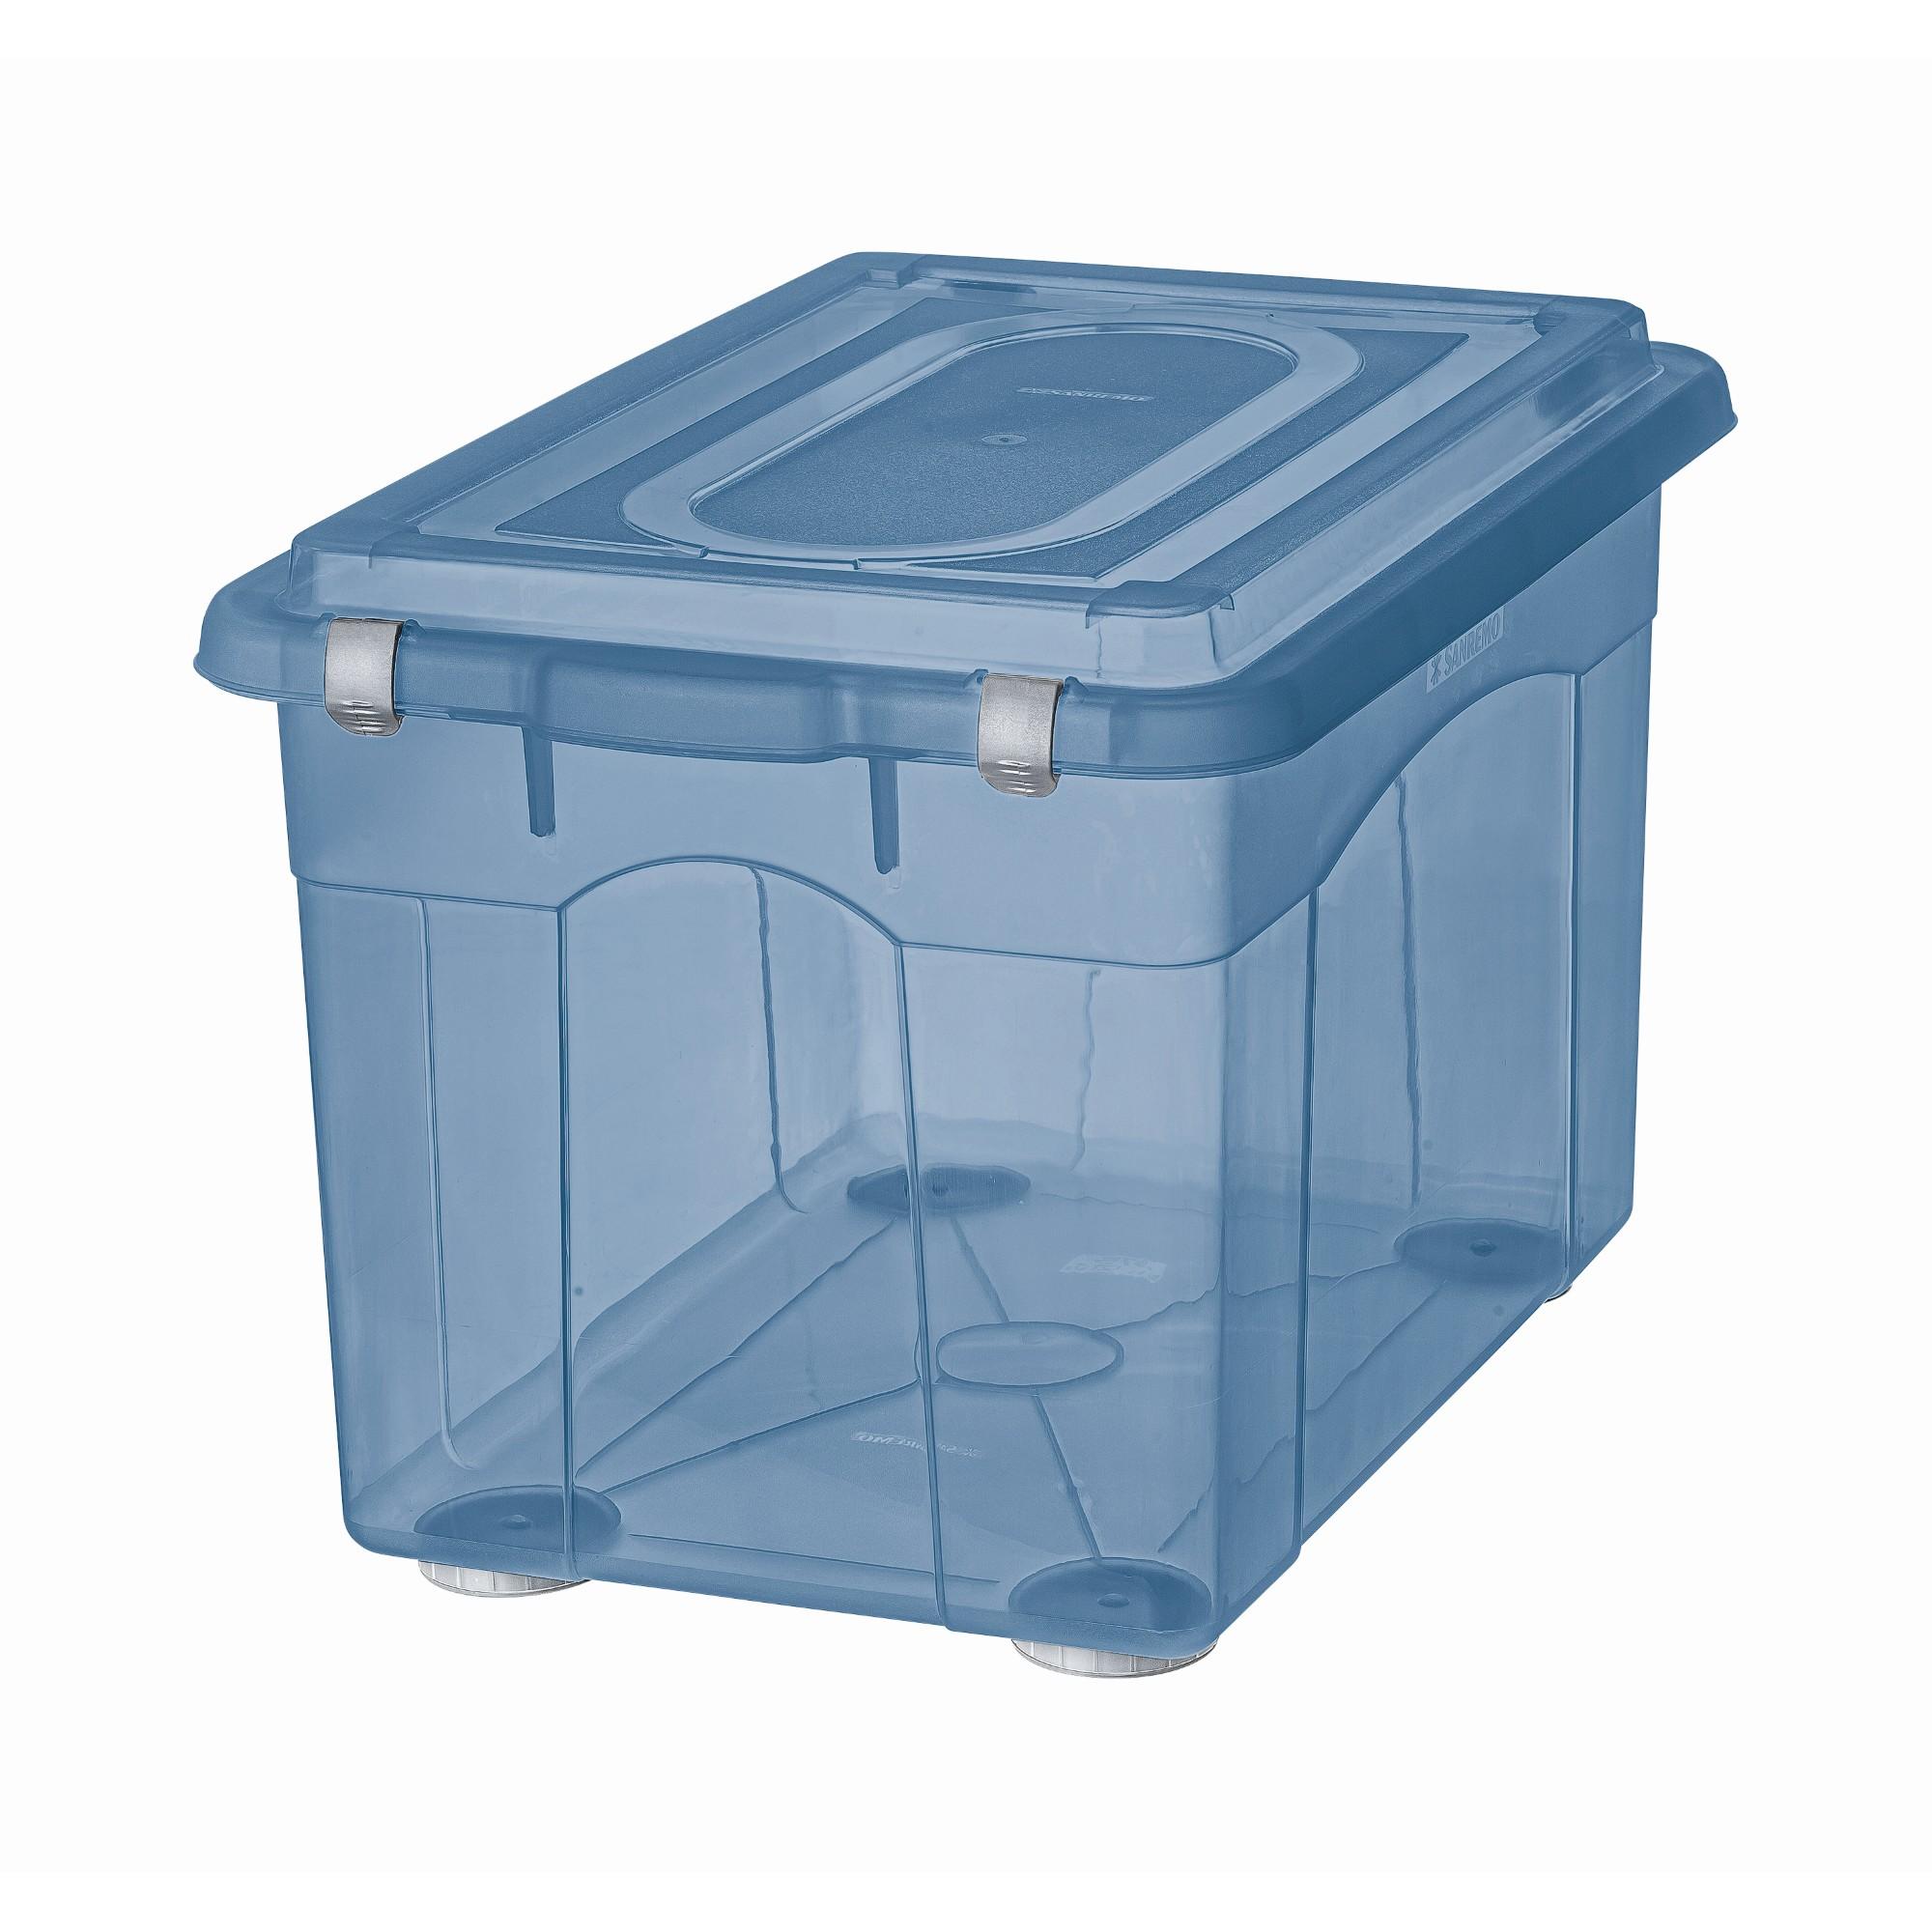 Caixa Organizadora Retangular 560L Azul SR97586 - Sanremo